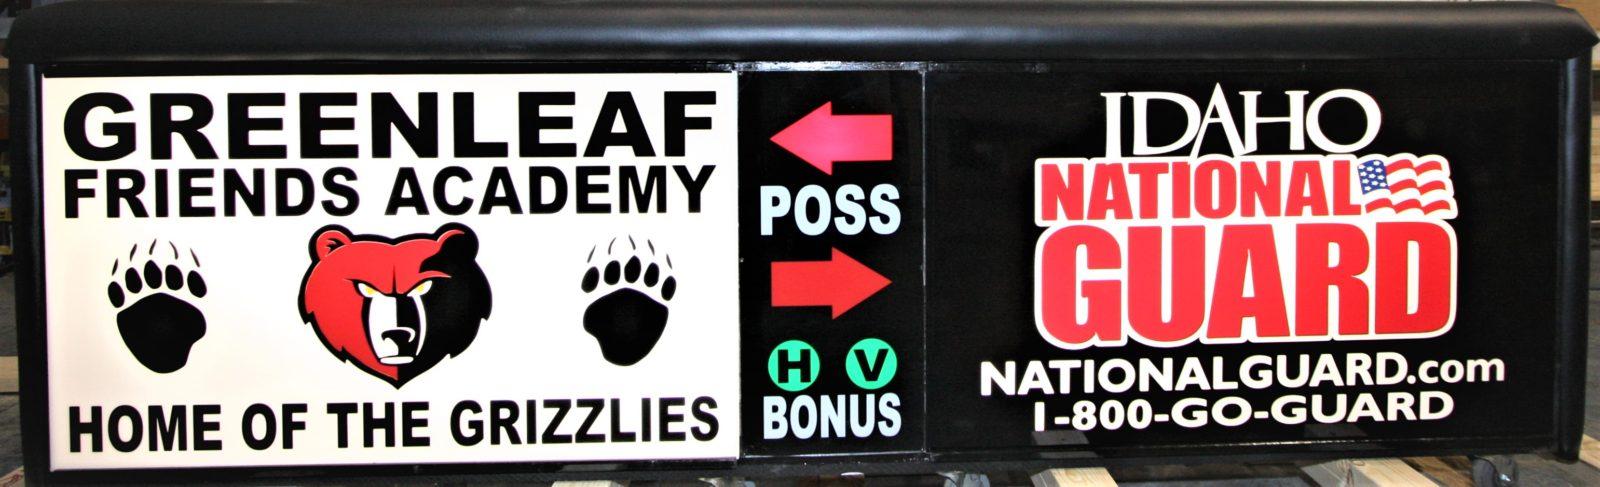 Greenleaf High School Idaho national Guard Scoring Table